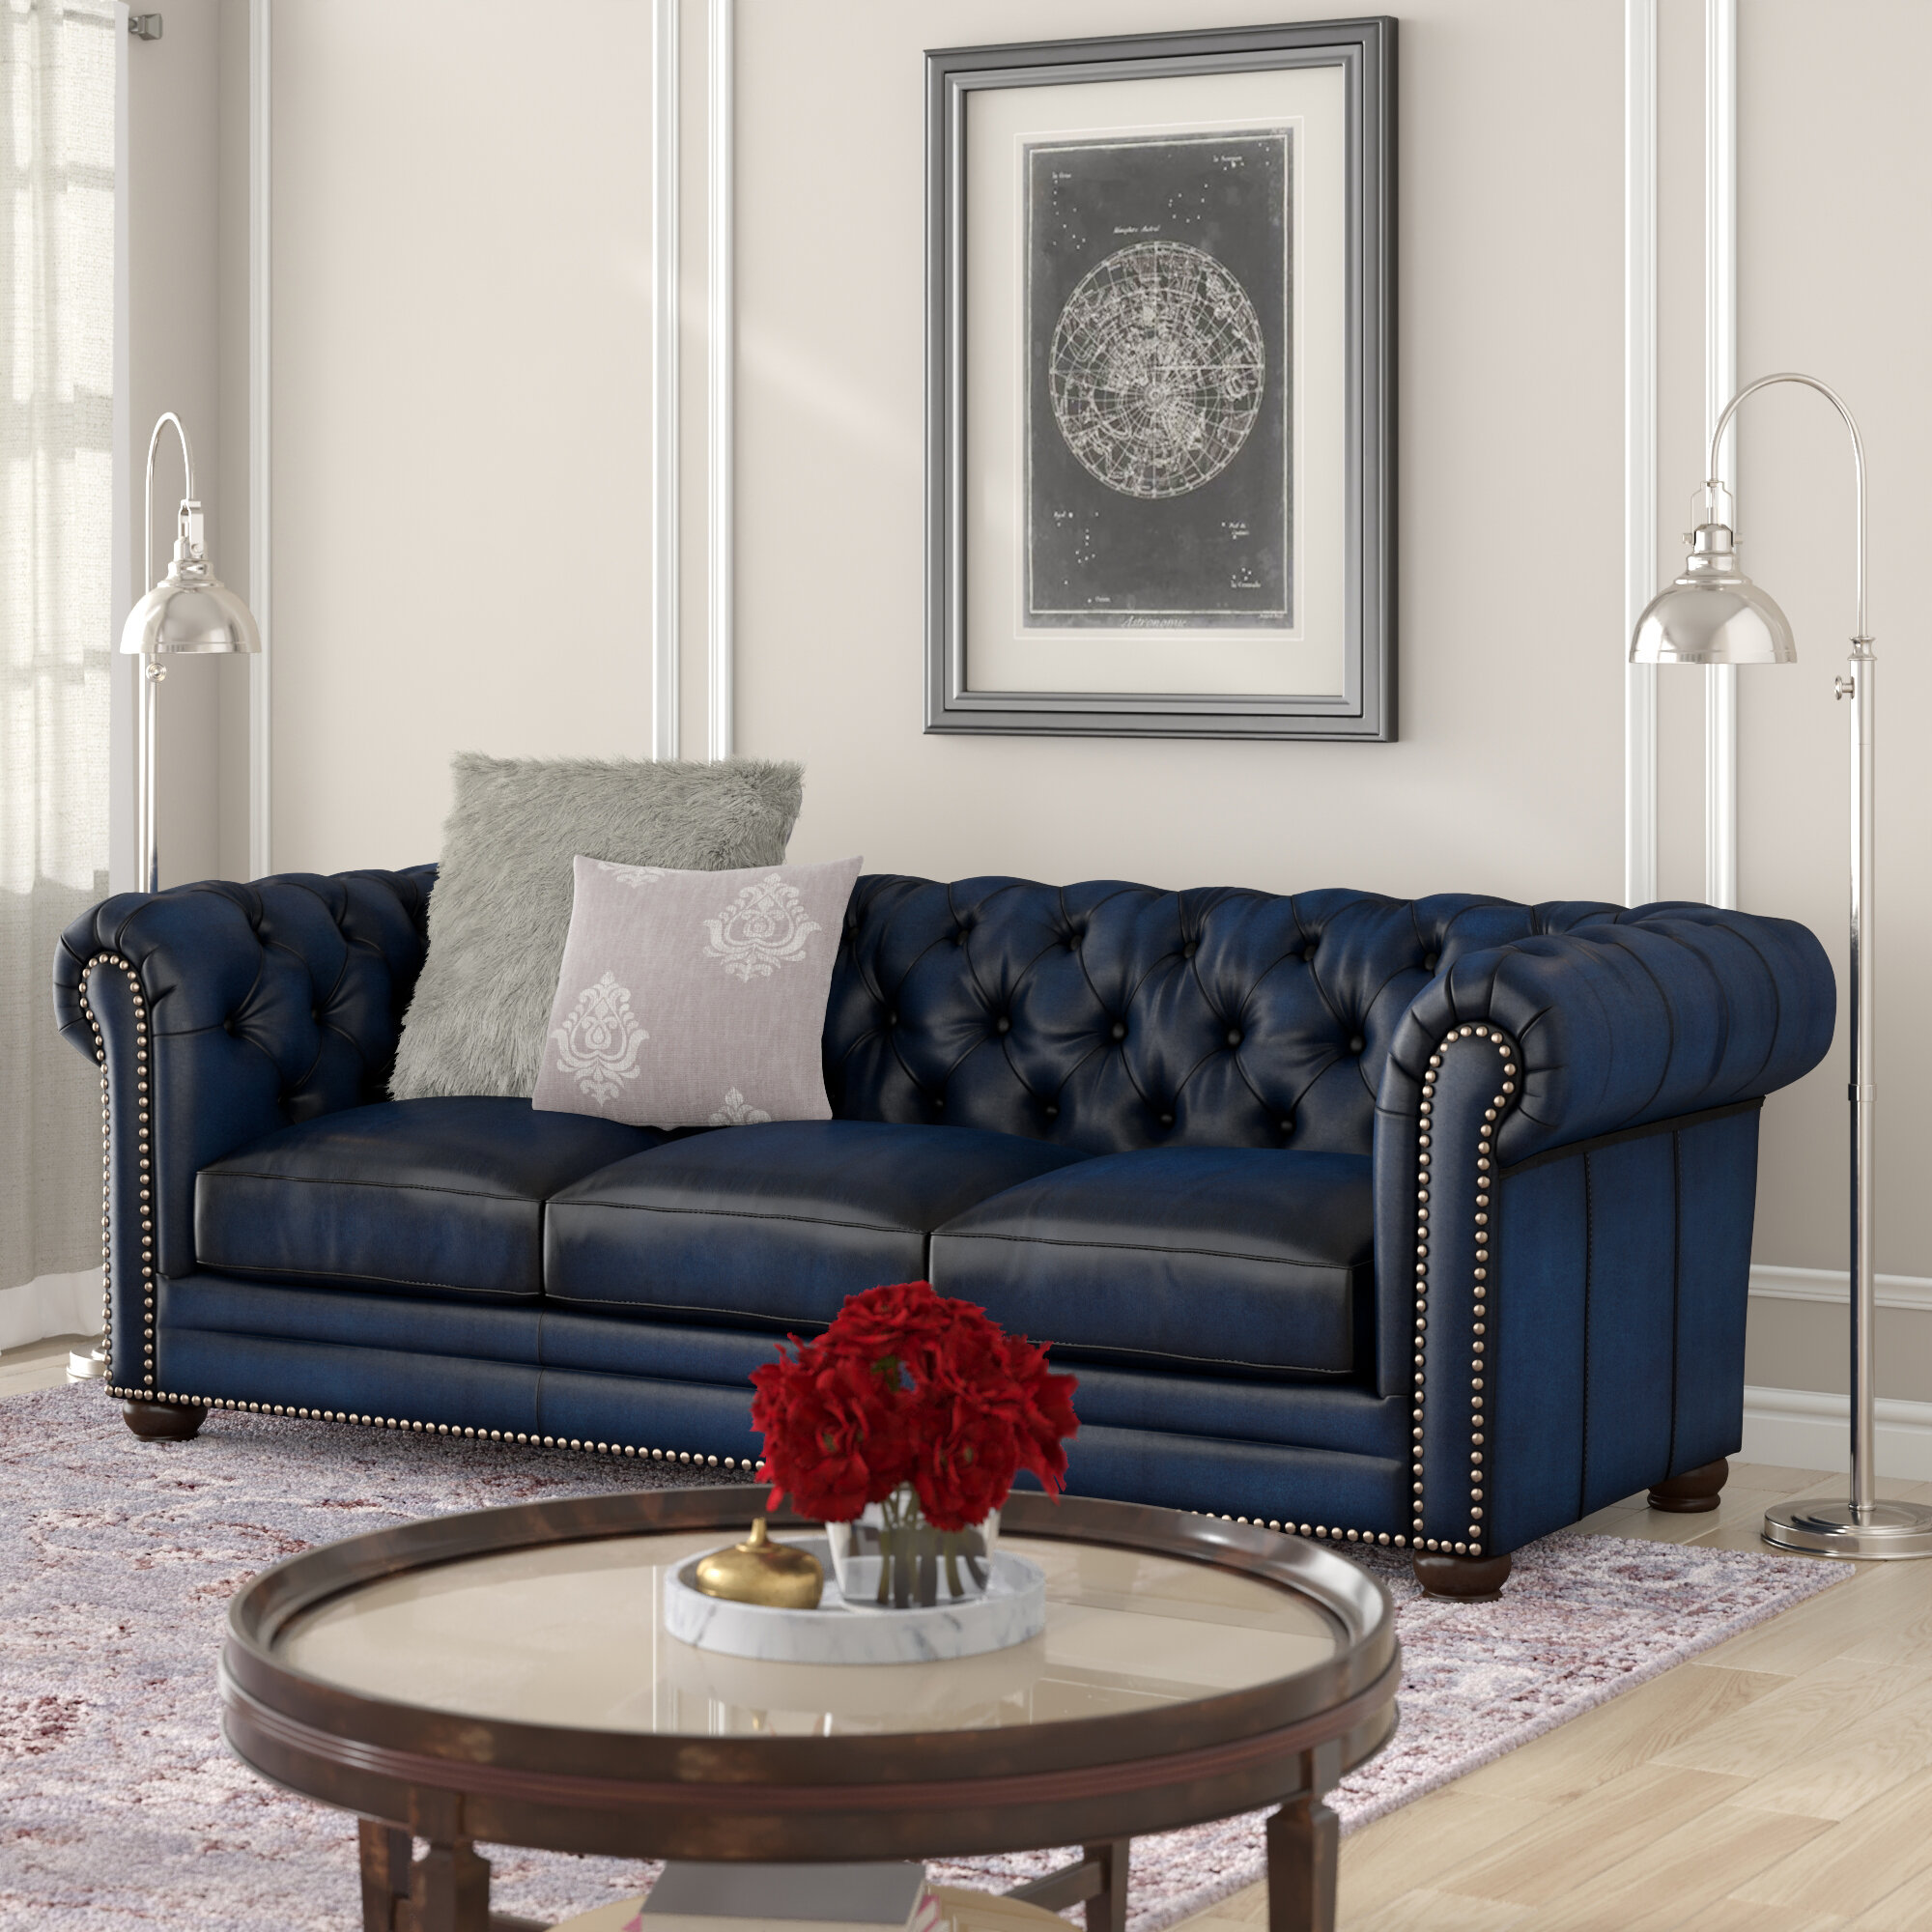 Canora Grey Kraig Genuine Leather 92 Wide Rolled Arm Chesterfield Sofa Reviews Wayfair